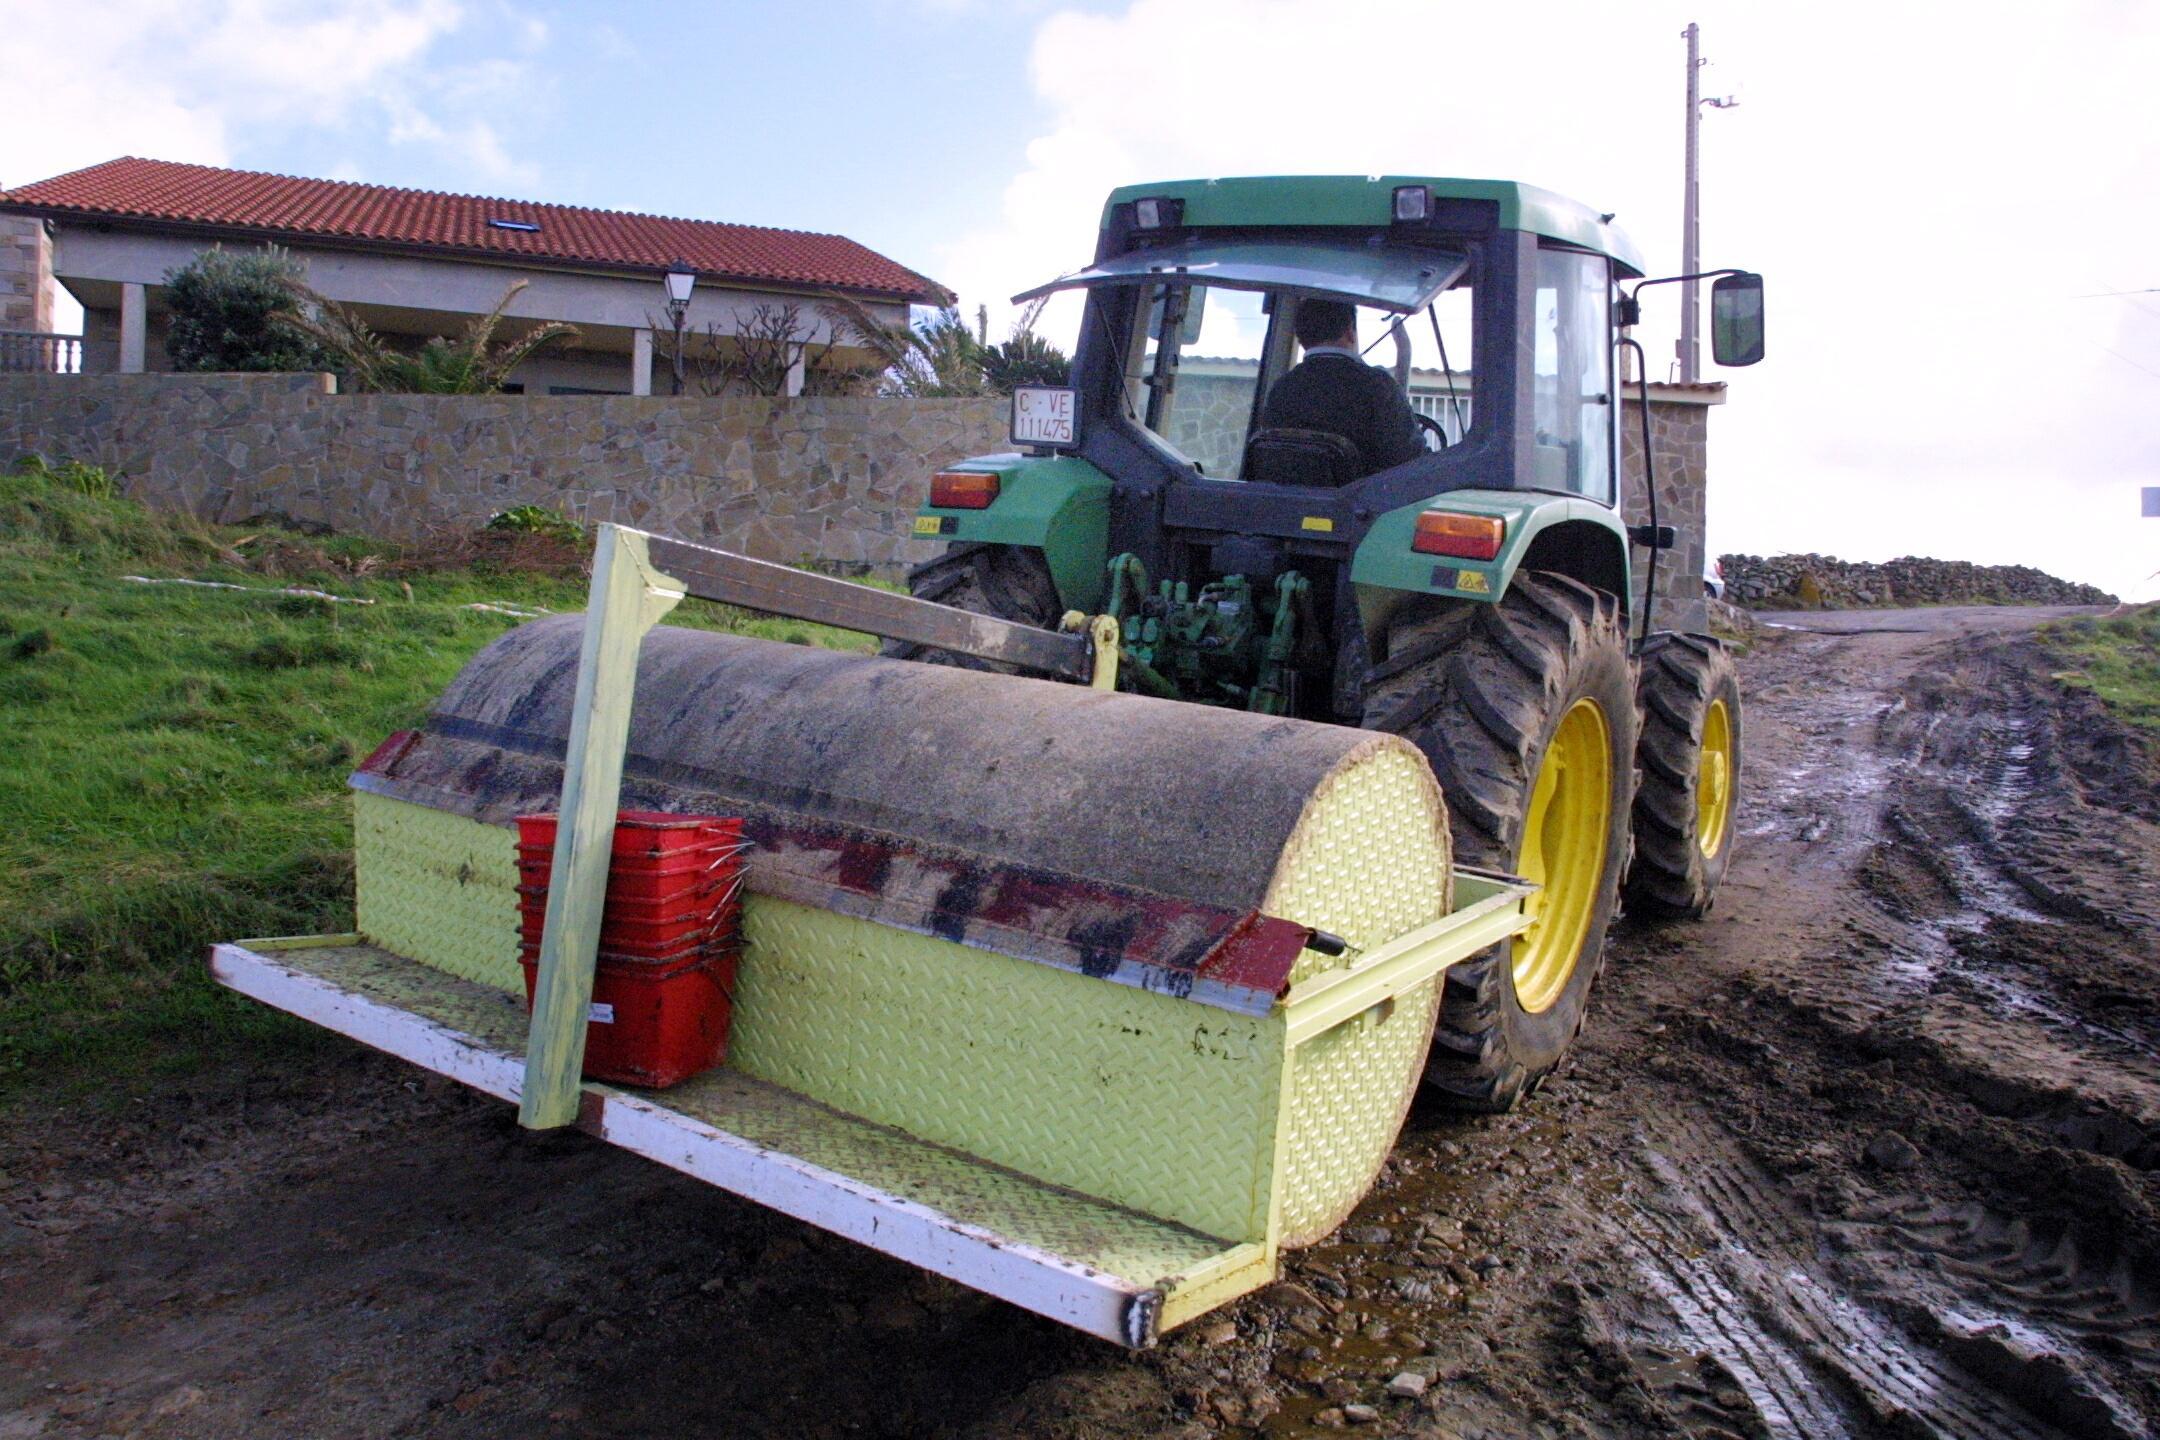 Rodillo impulsado por tractor <br>Carmela Queijeiro